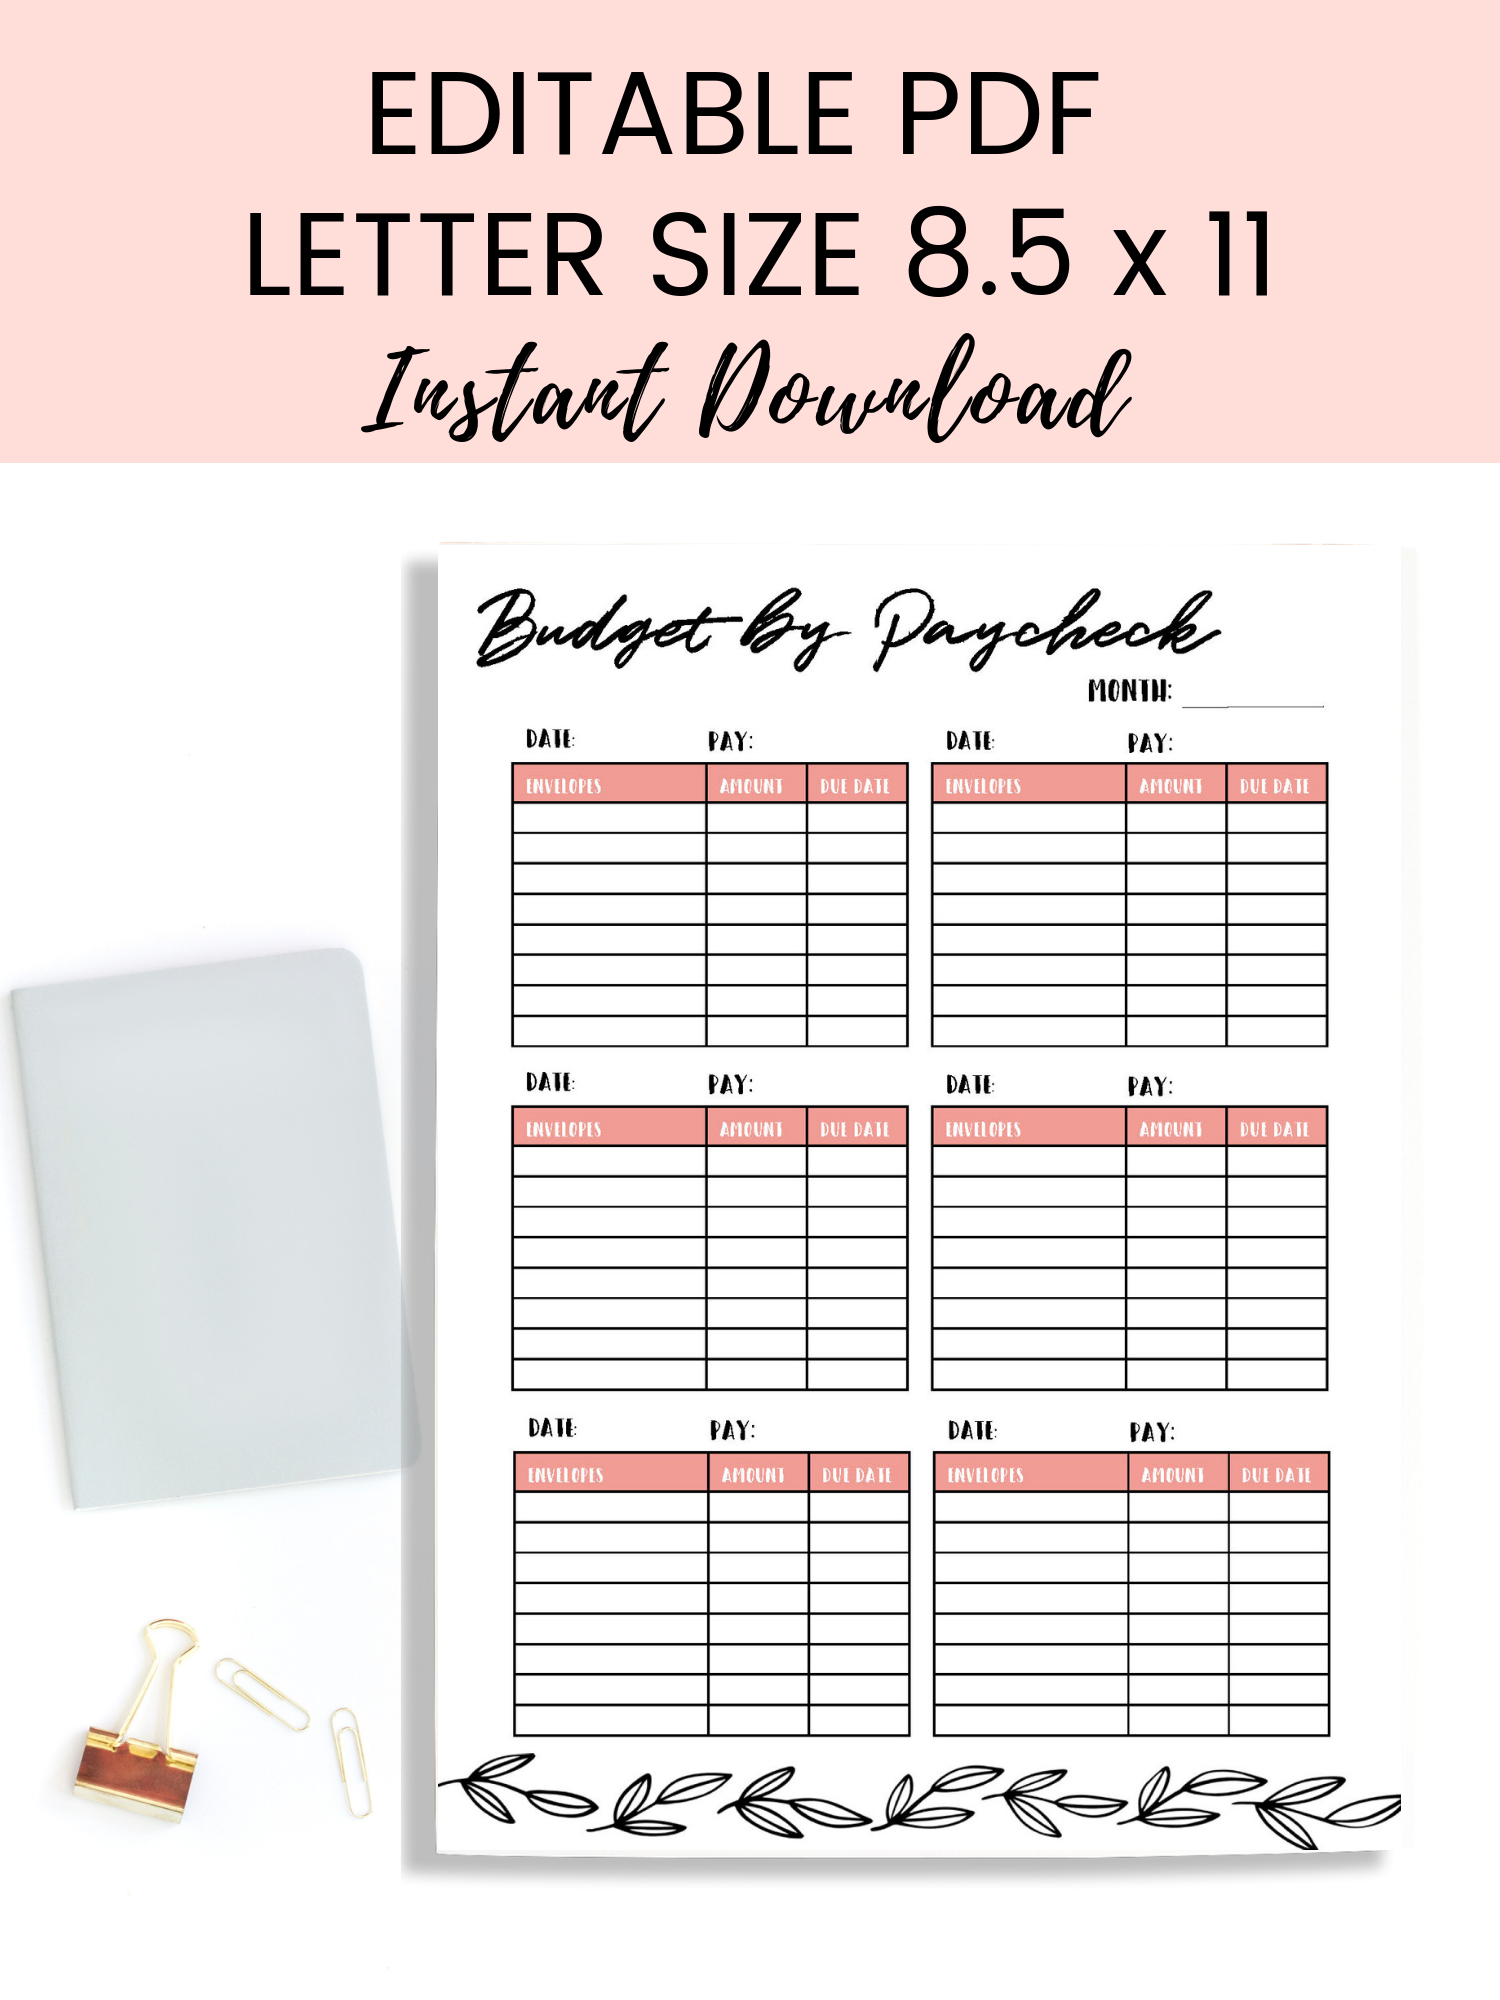 Budget By Paycheck Editable Printable Budget